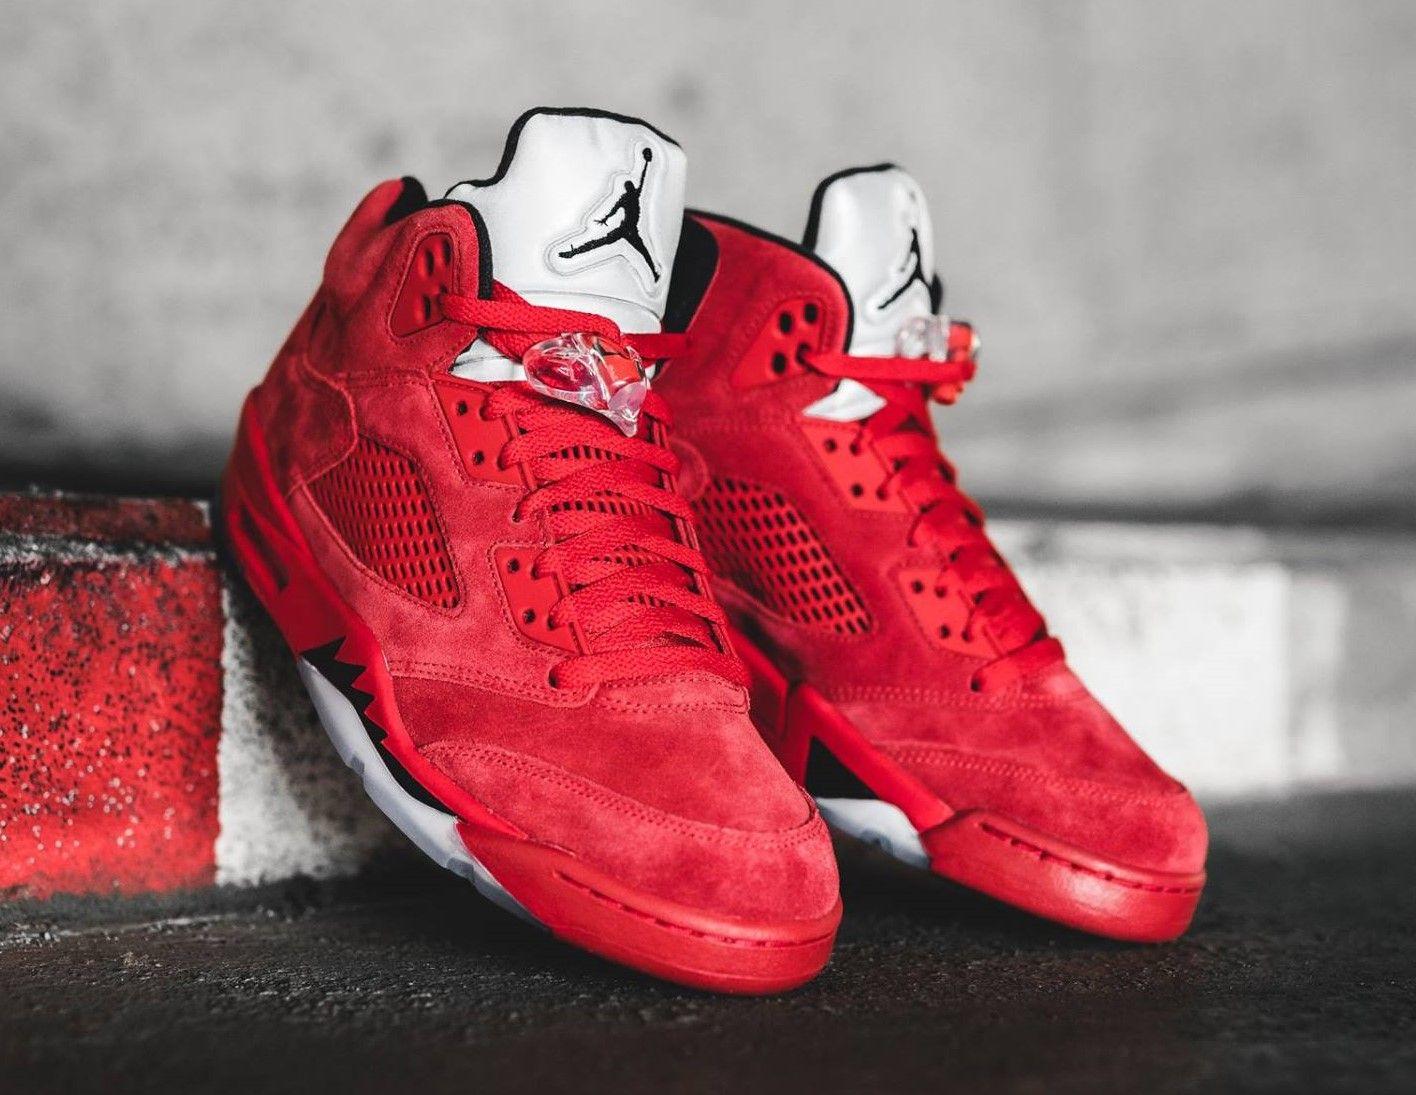 the latest 8313c 8f298 Air Jordan 5 Red Suede In 2009, Jordan Brand appeared the Raging Bull Air  Jordan 5. For 2017, they re set